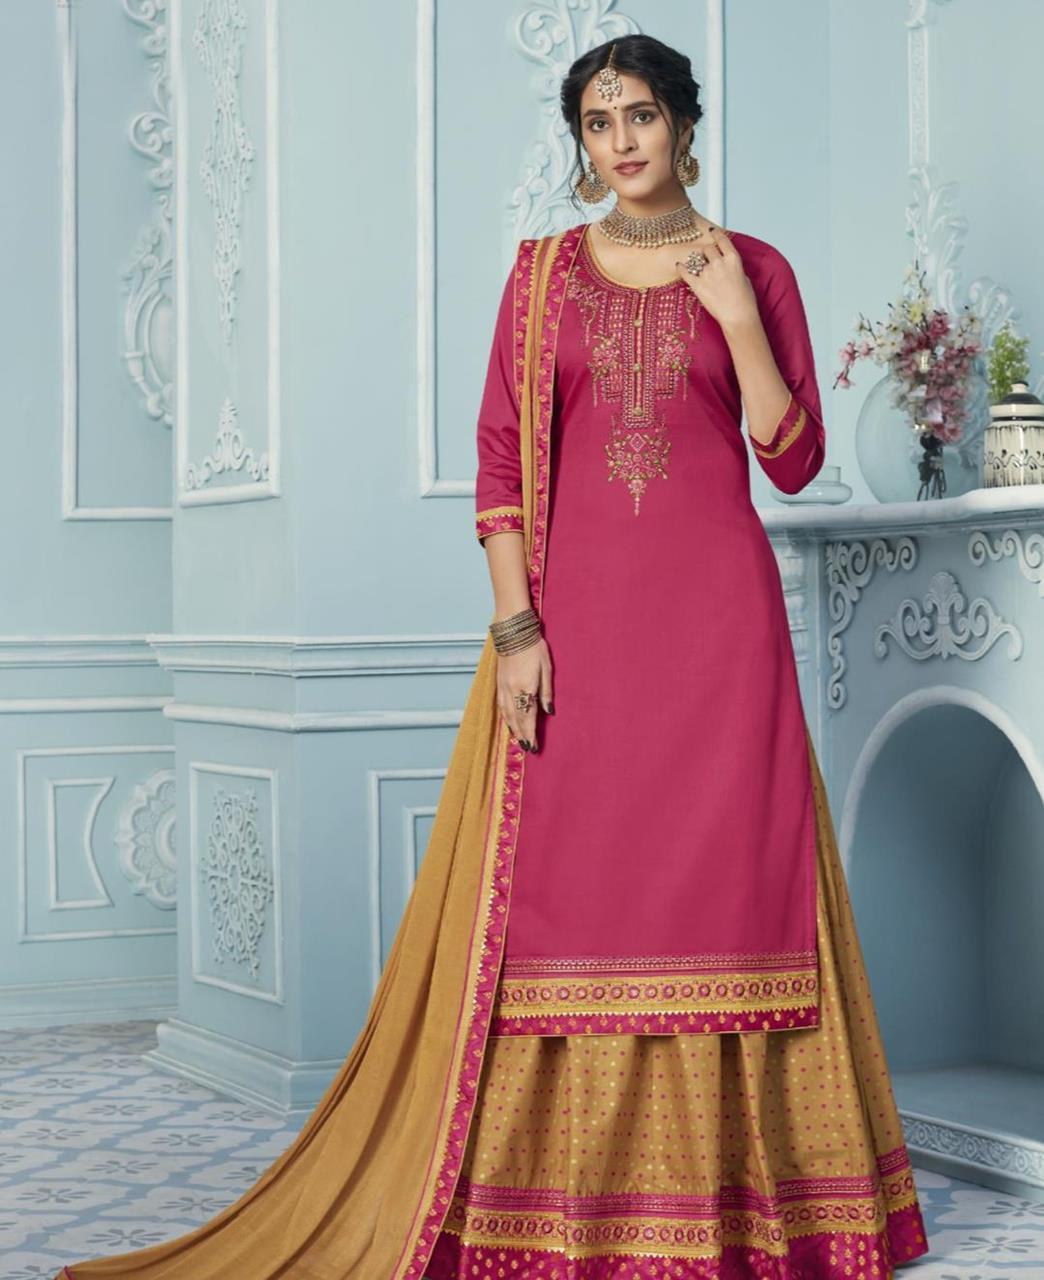 Embroidered Cotton Straight cut Salwar Kameez in Pink